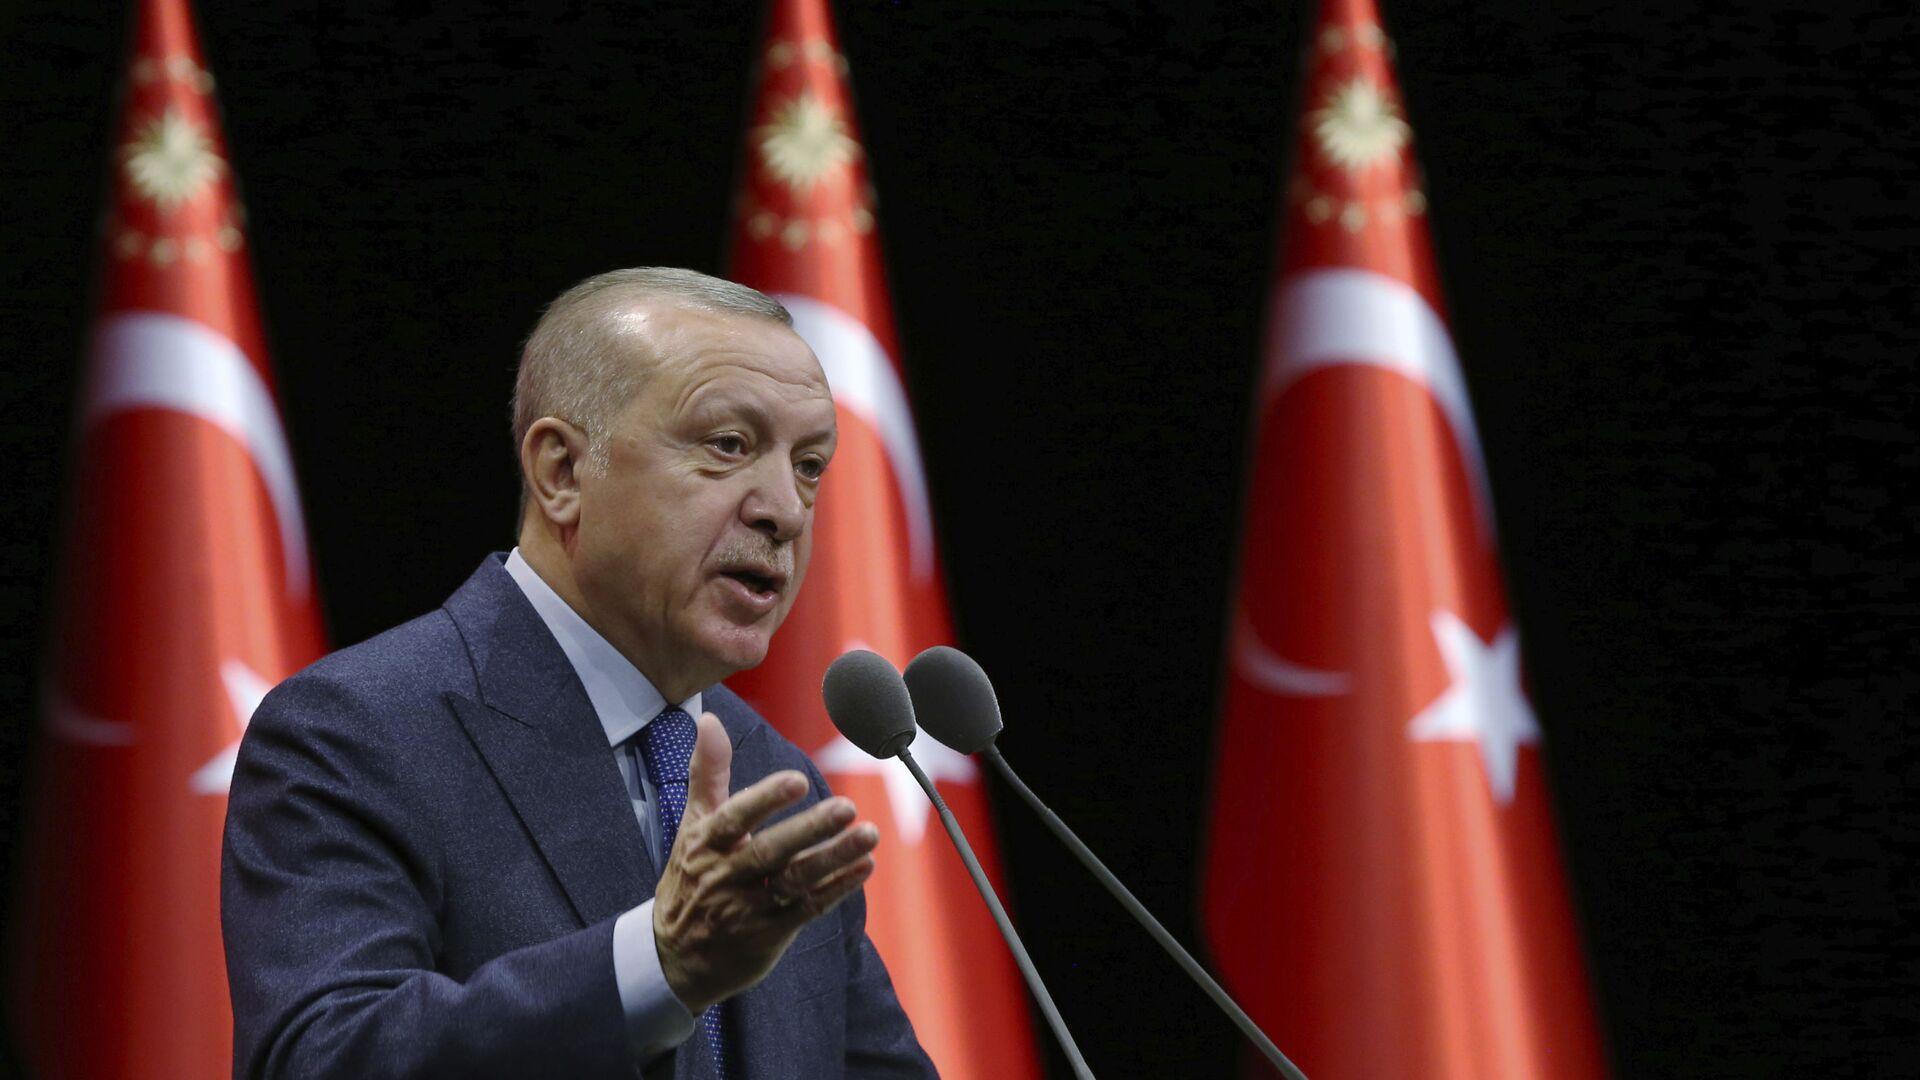 Turecký prezident Recep Tayyip Erdogan - Sputnik Česká republika, 1920, 18.05.2021